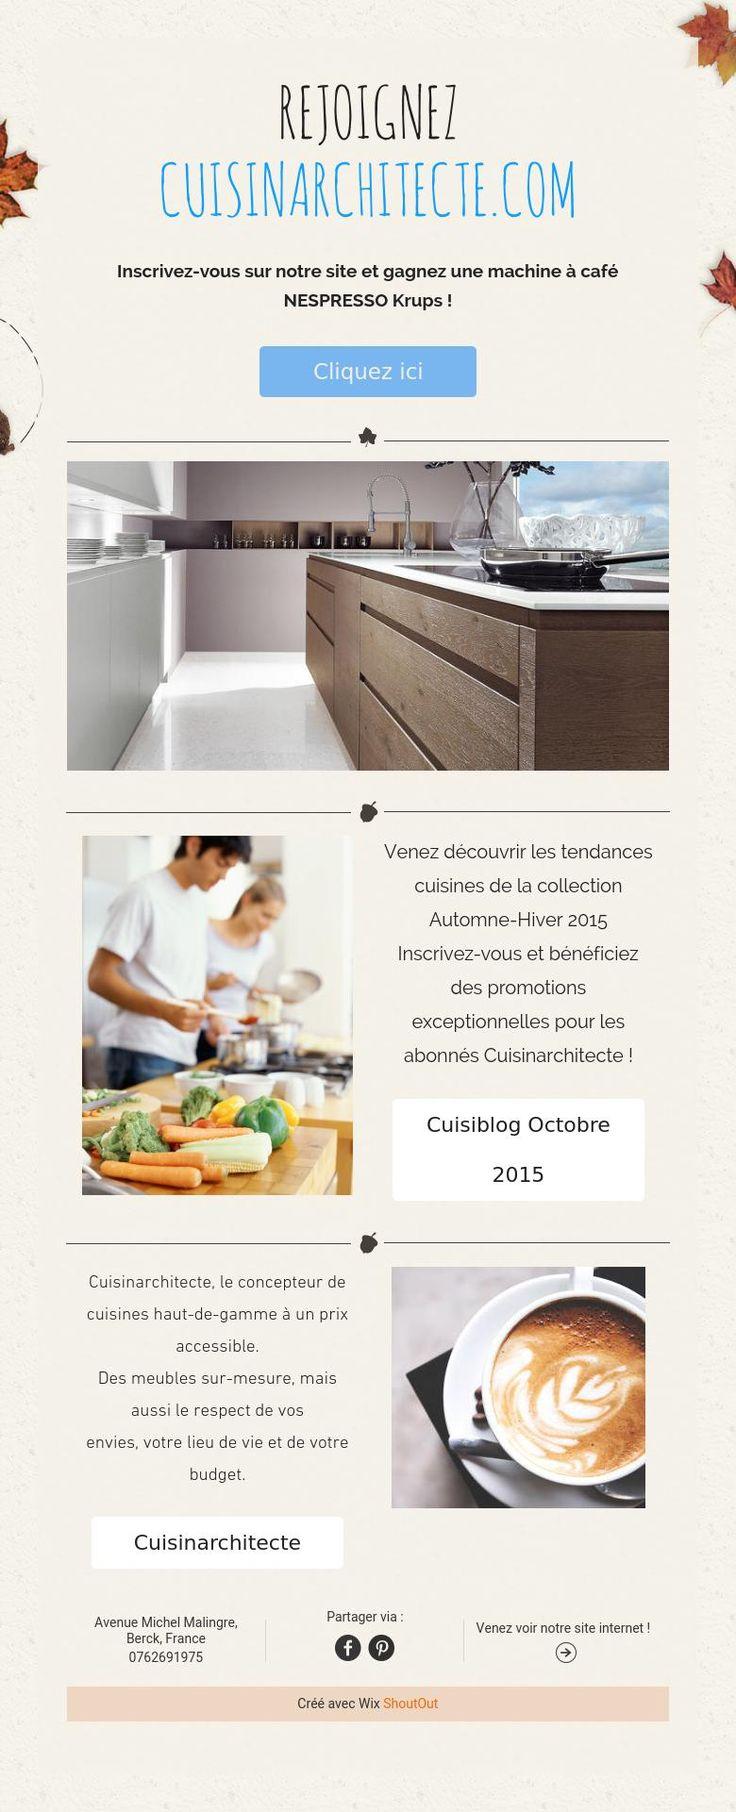 Lovely Rejoignez cuisinarchitecte